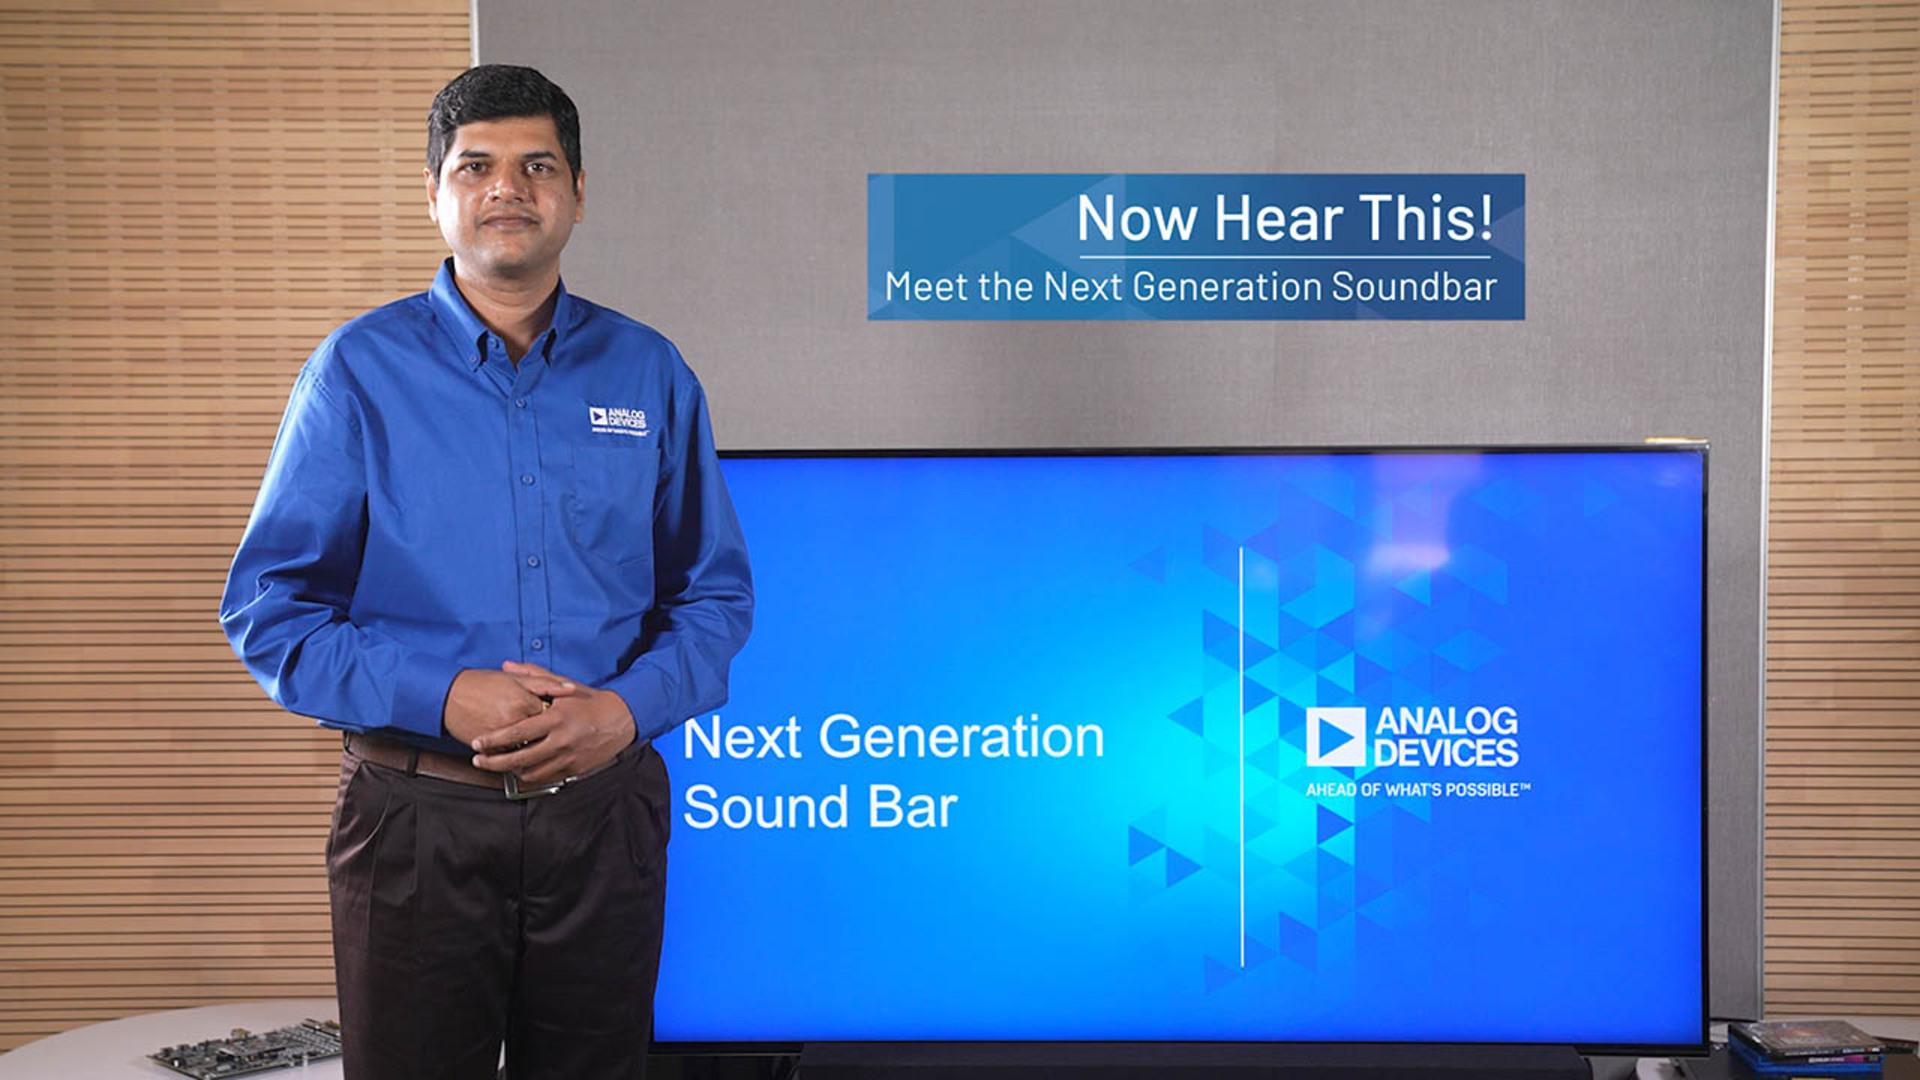 Now Hear This! Meet the Next-Generation Soundbar